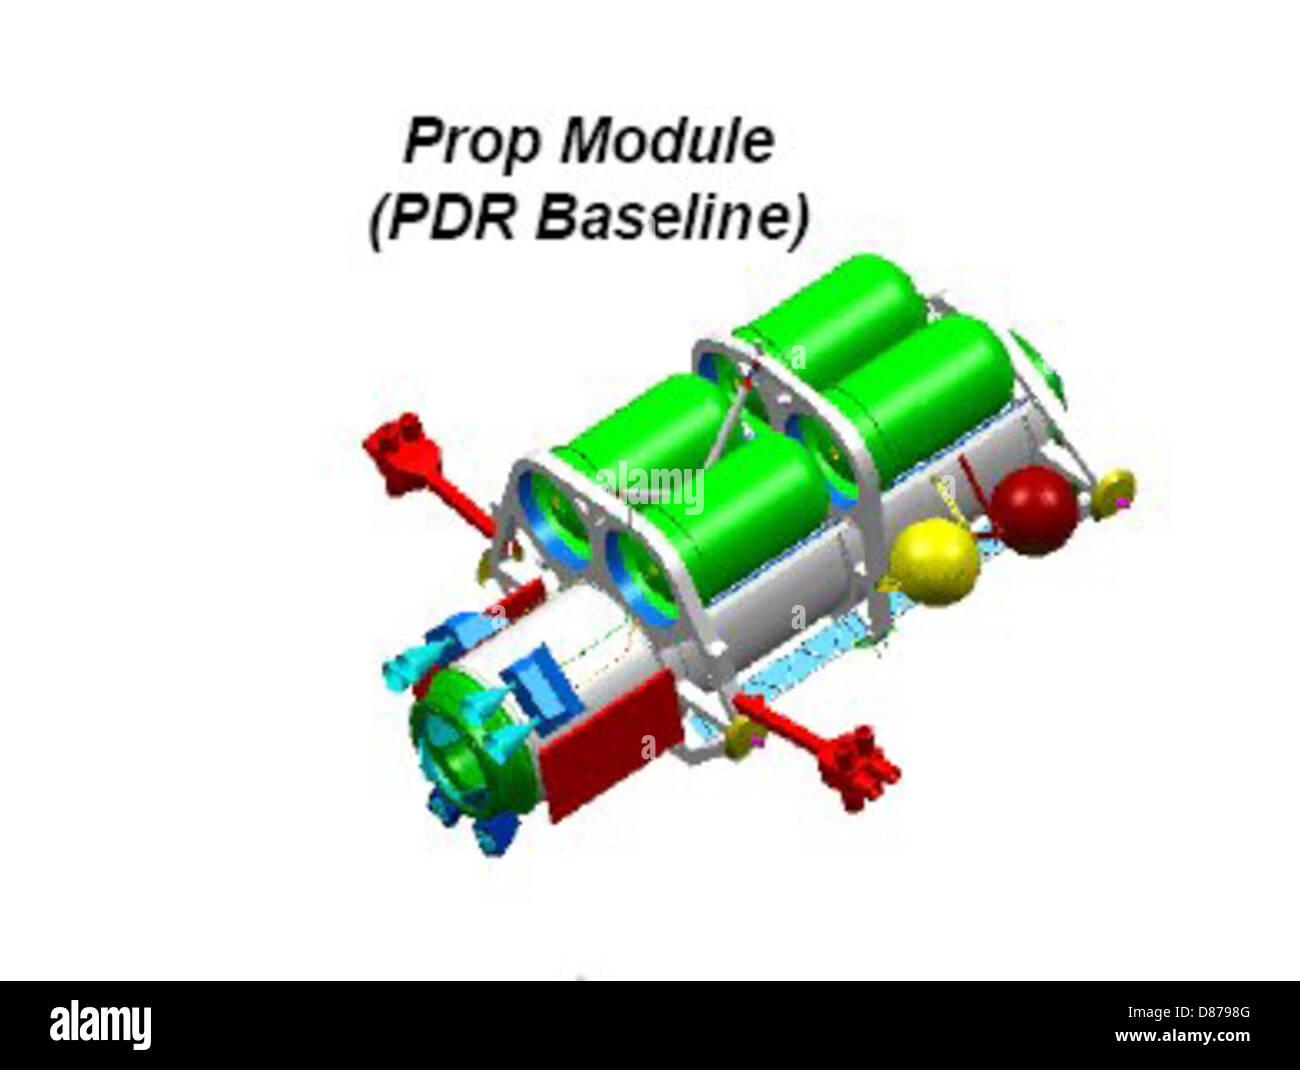 ISS Propulsion module.jpg Stock Photo